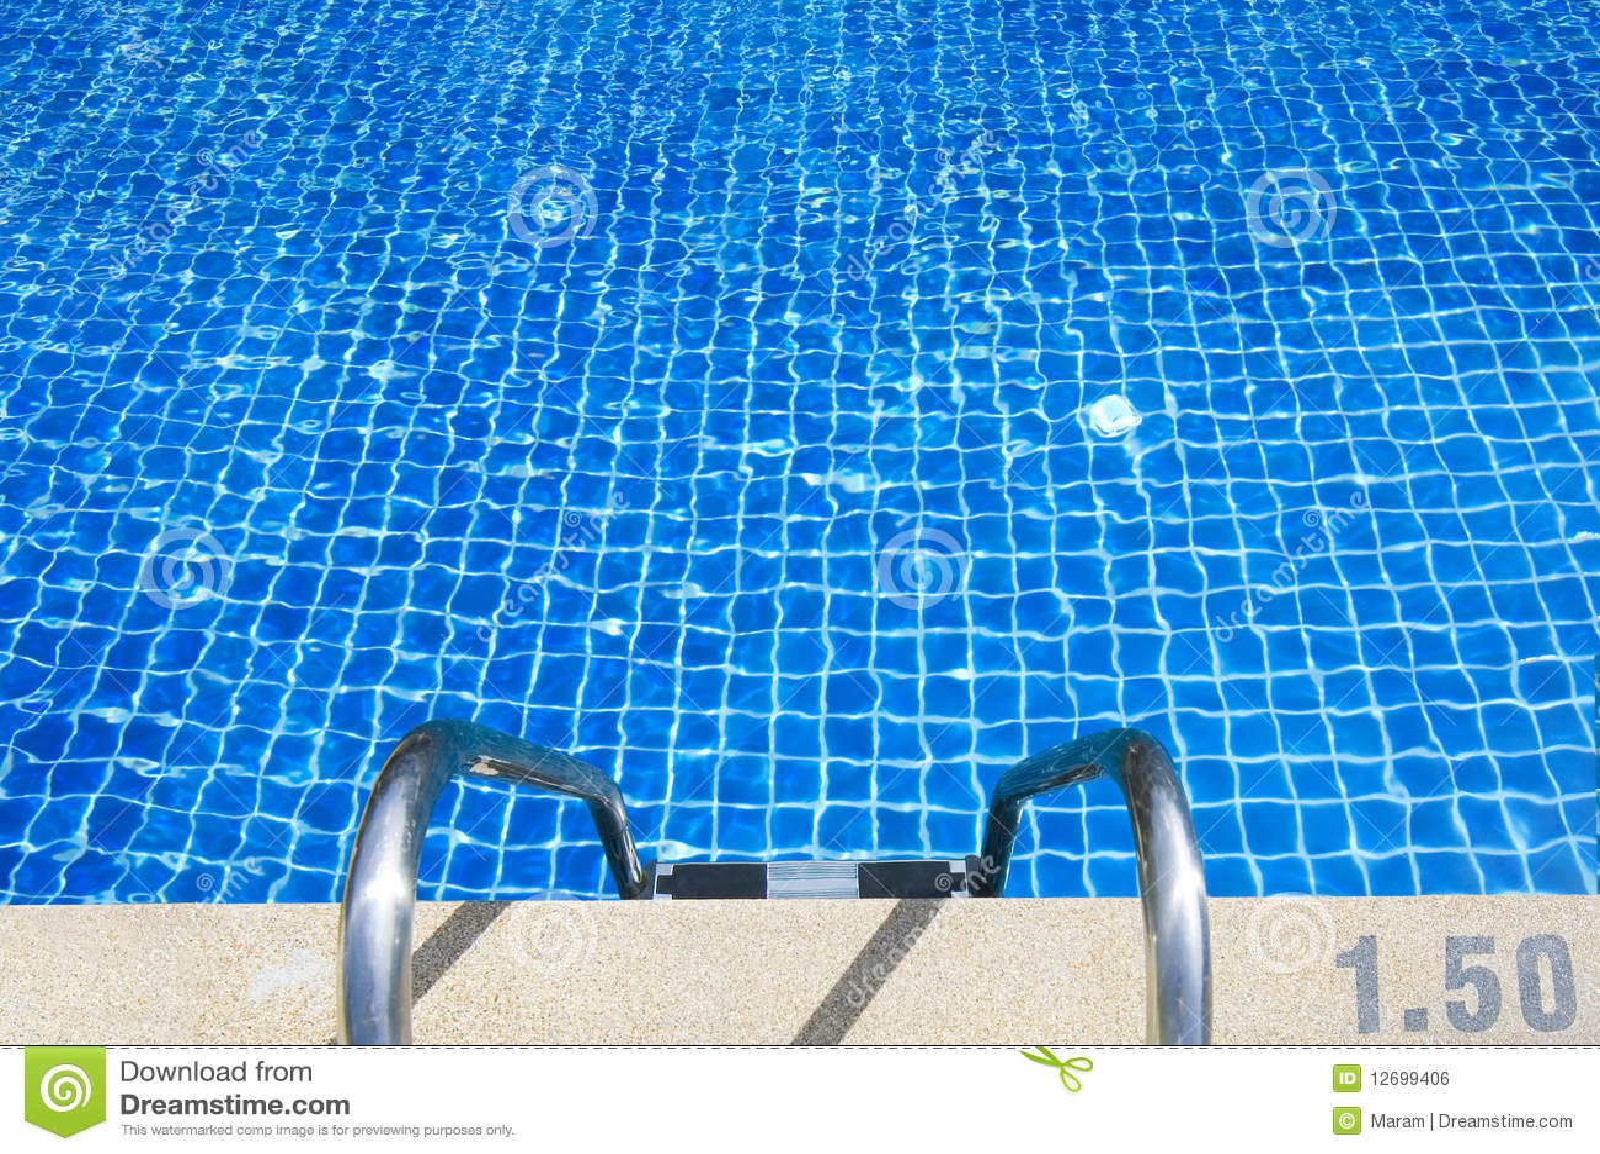 Swimming Pool Close Up Royalty Free Stock Image Image 12699406